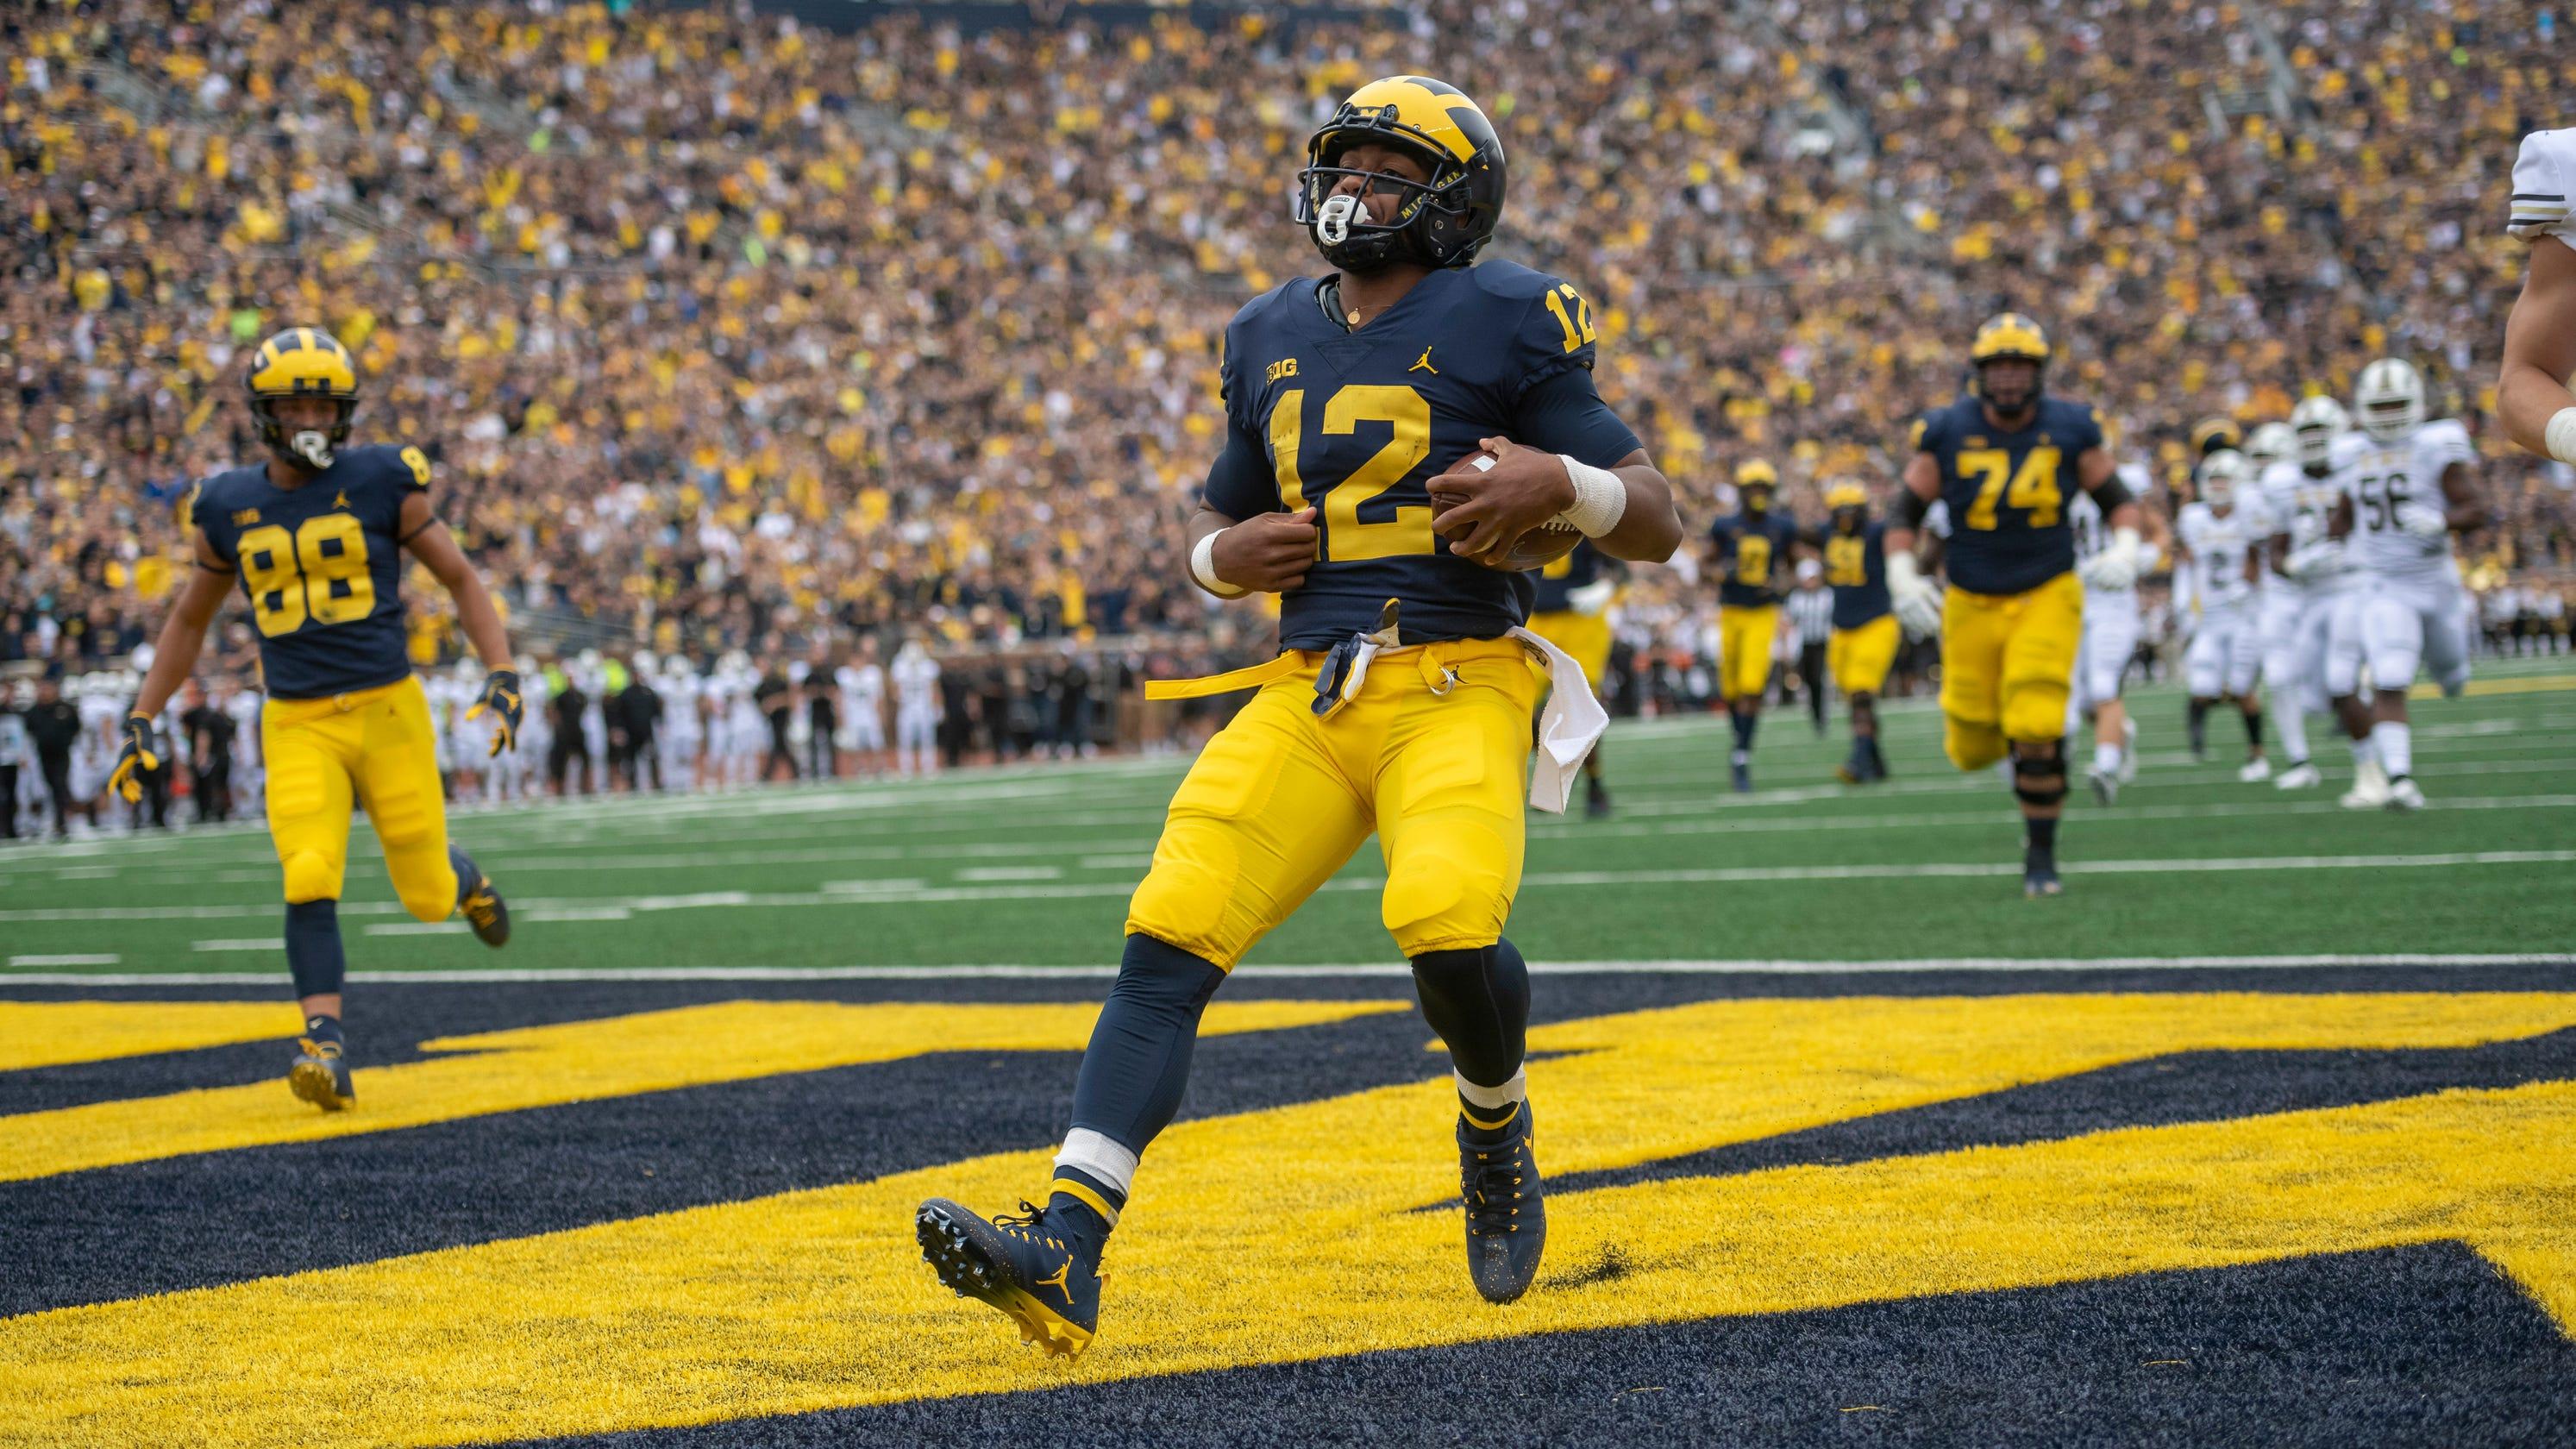 Top Running Back Chris Evans No Longer On Michigan Football Team